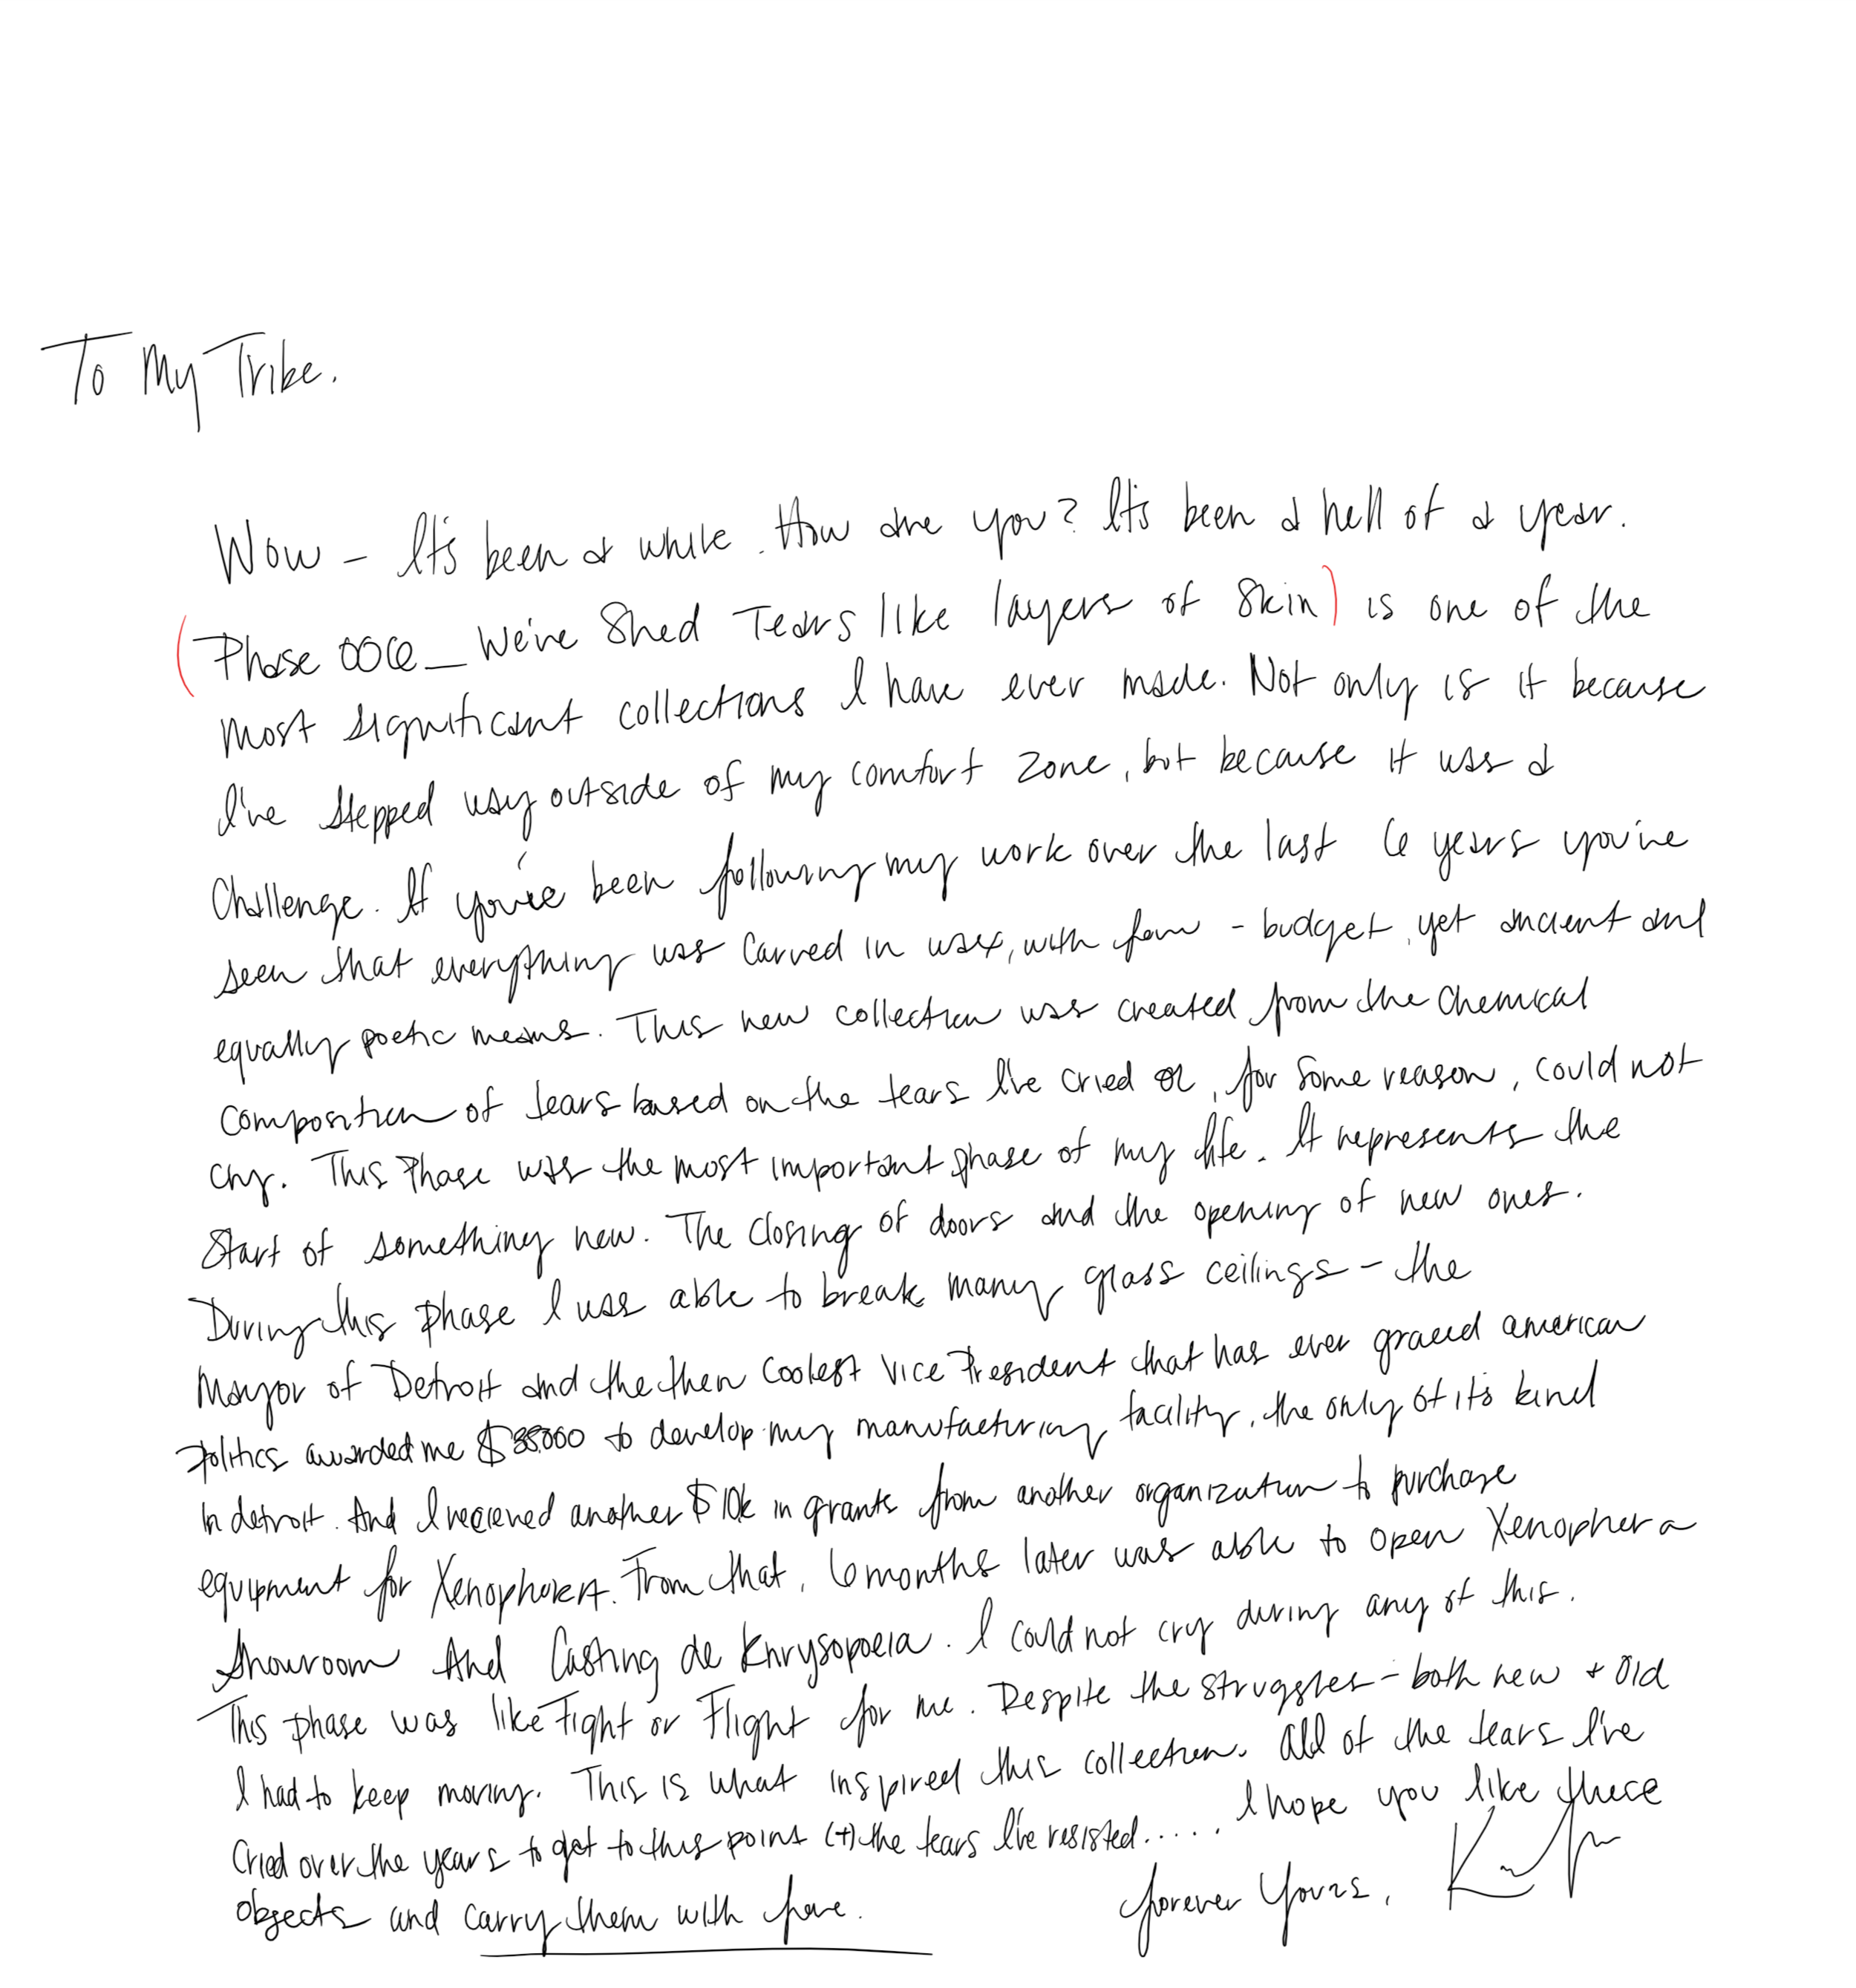 Karissma_Letter to Tribe.png